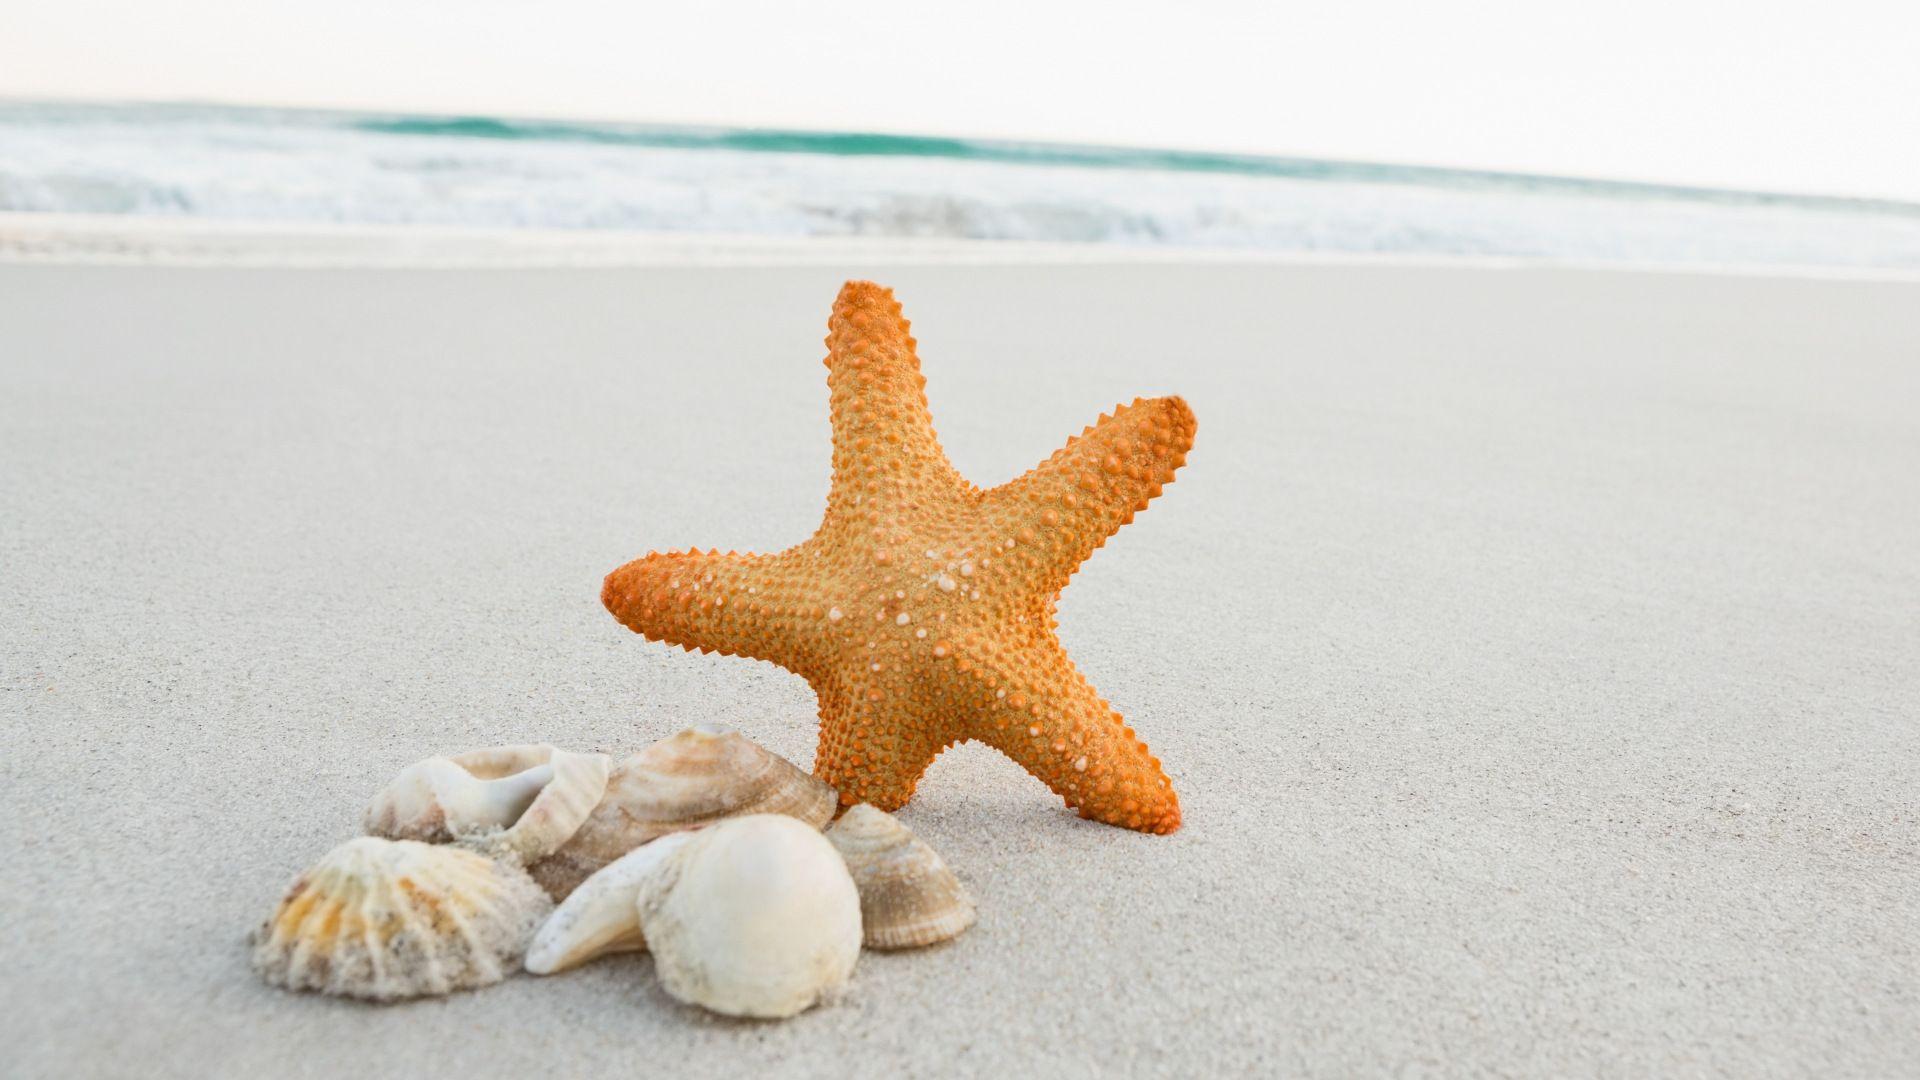 Starfish And Seashell At Beach 1920x1080 Sea Shells Investment Banking Starfish